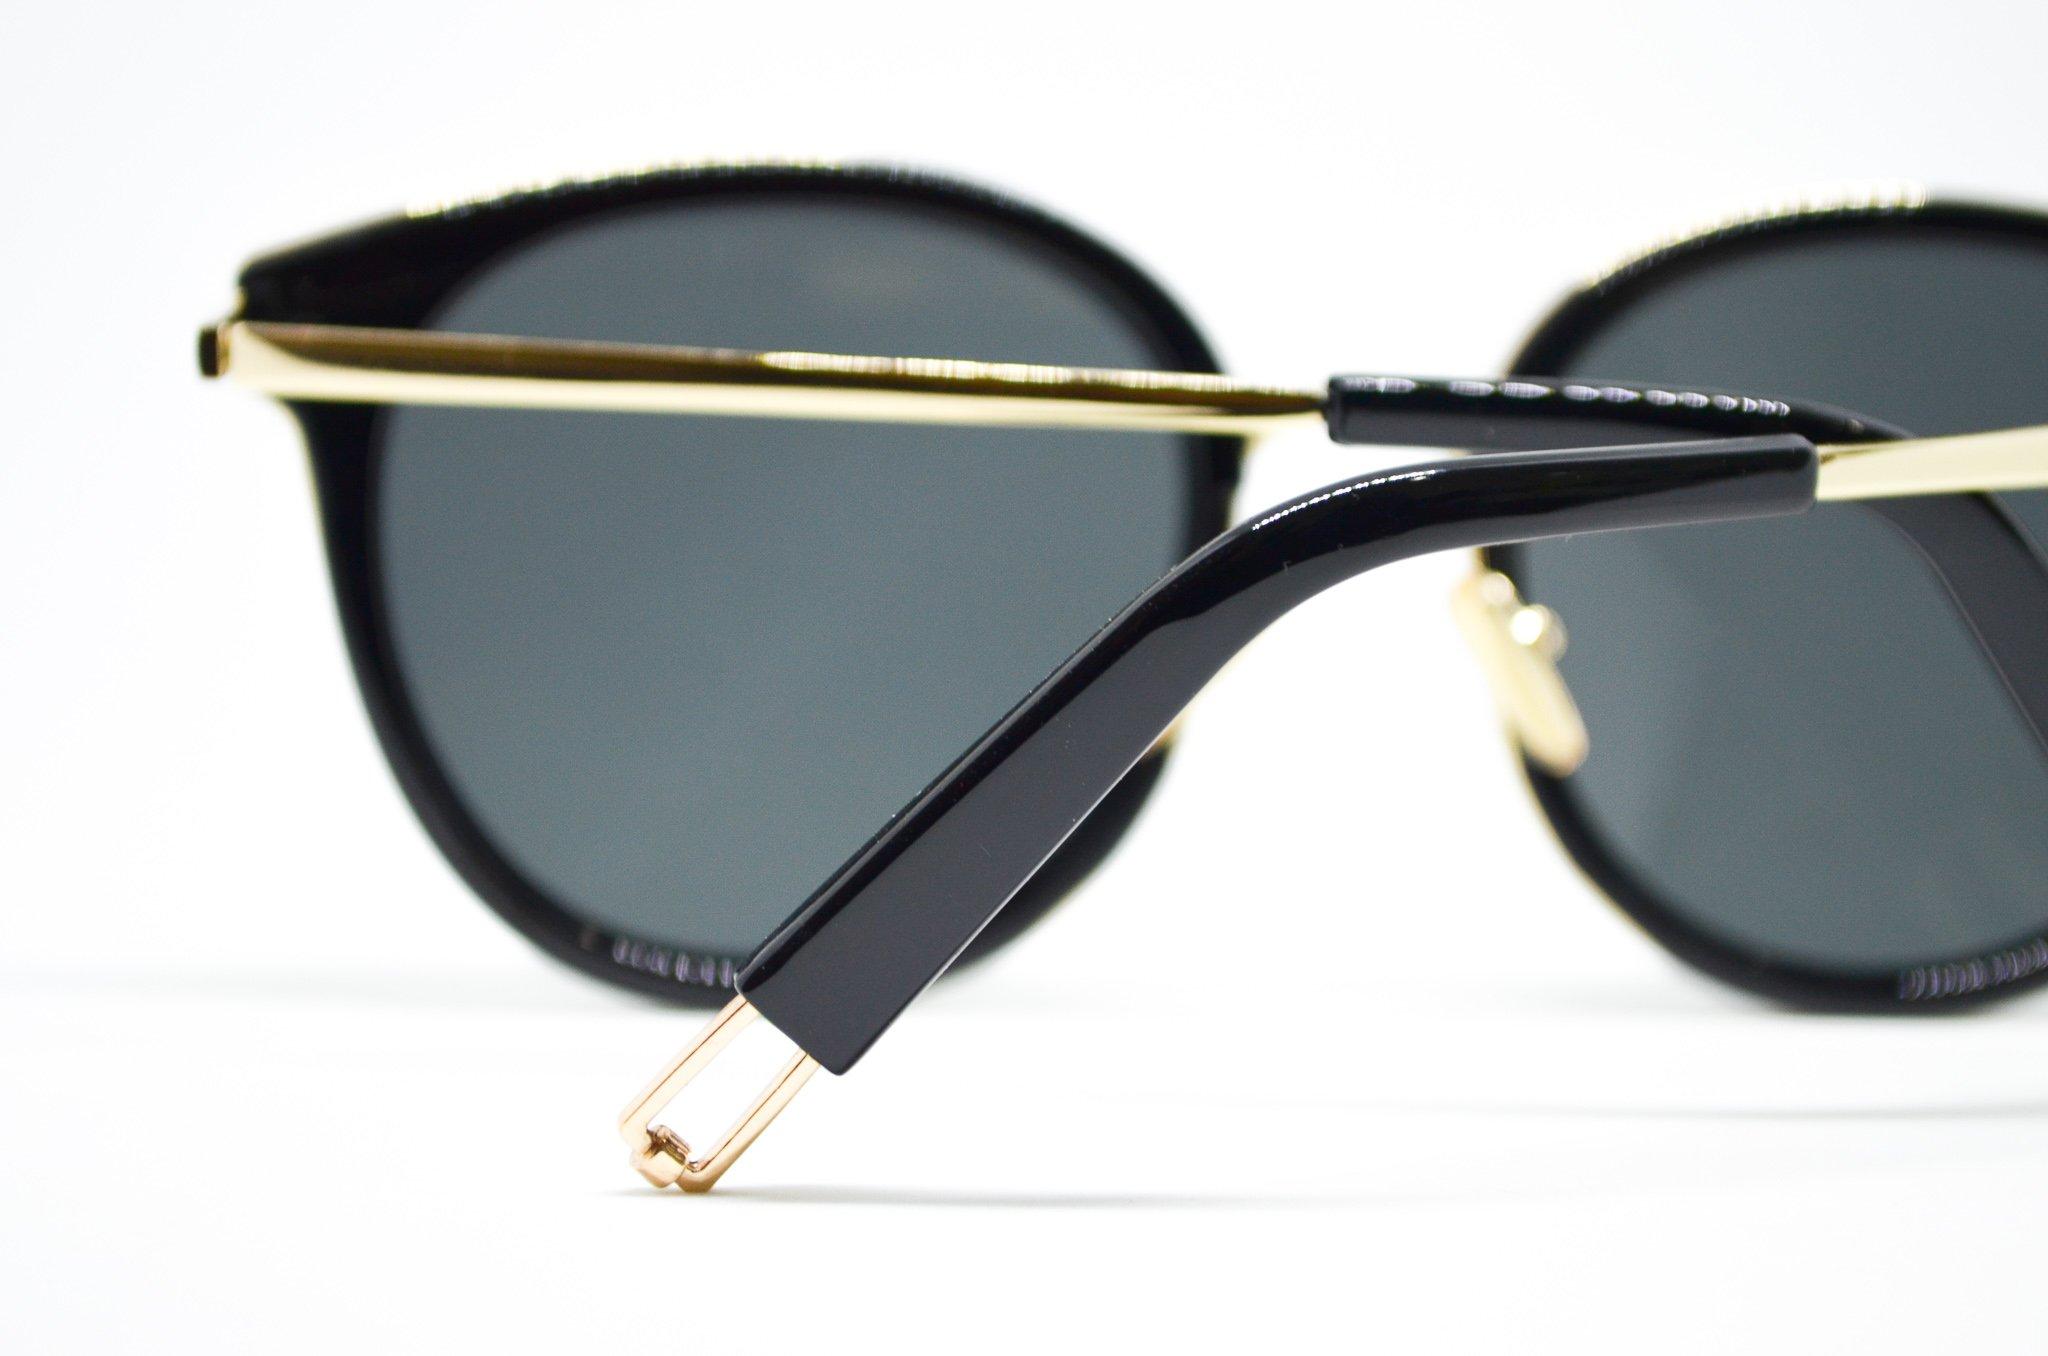 TQLA Sonnenbrille Unisex UV400 Mode Retro Polarisiert Sunglasses Damen Herren 2018 Trend